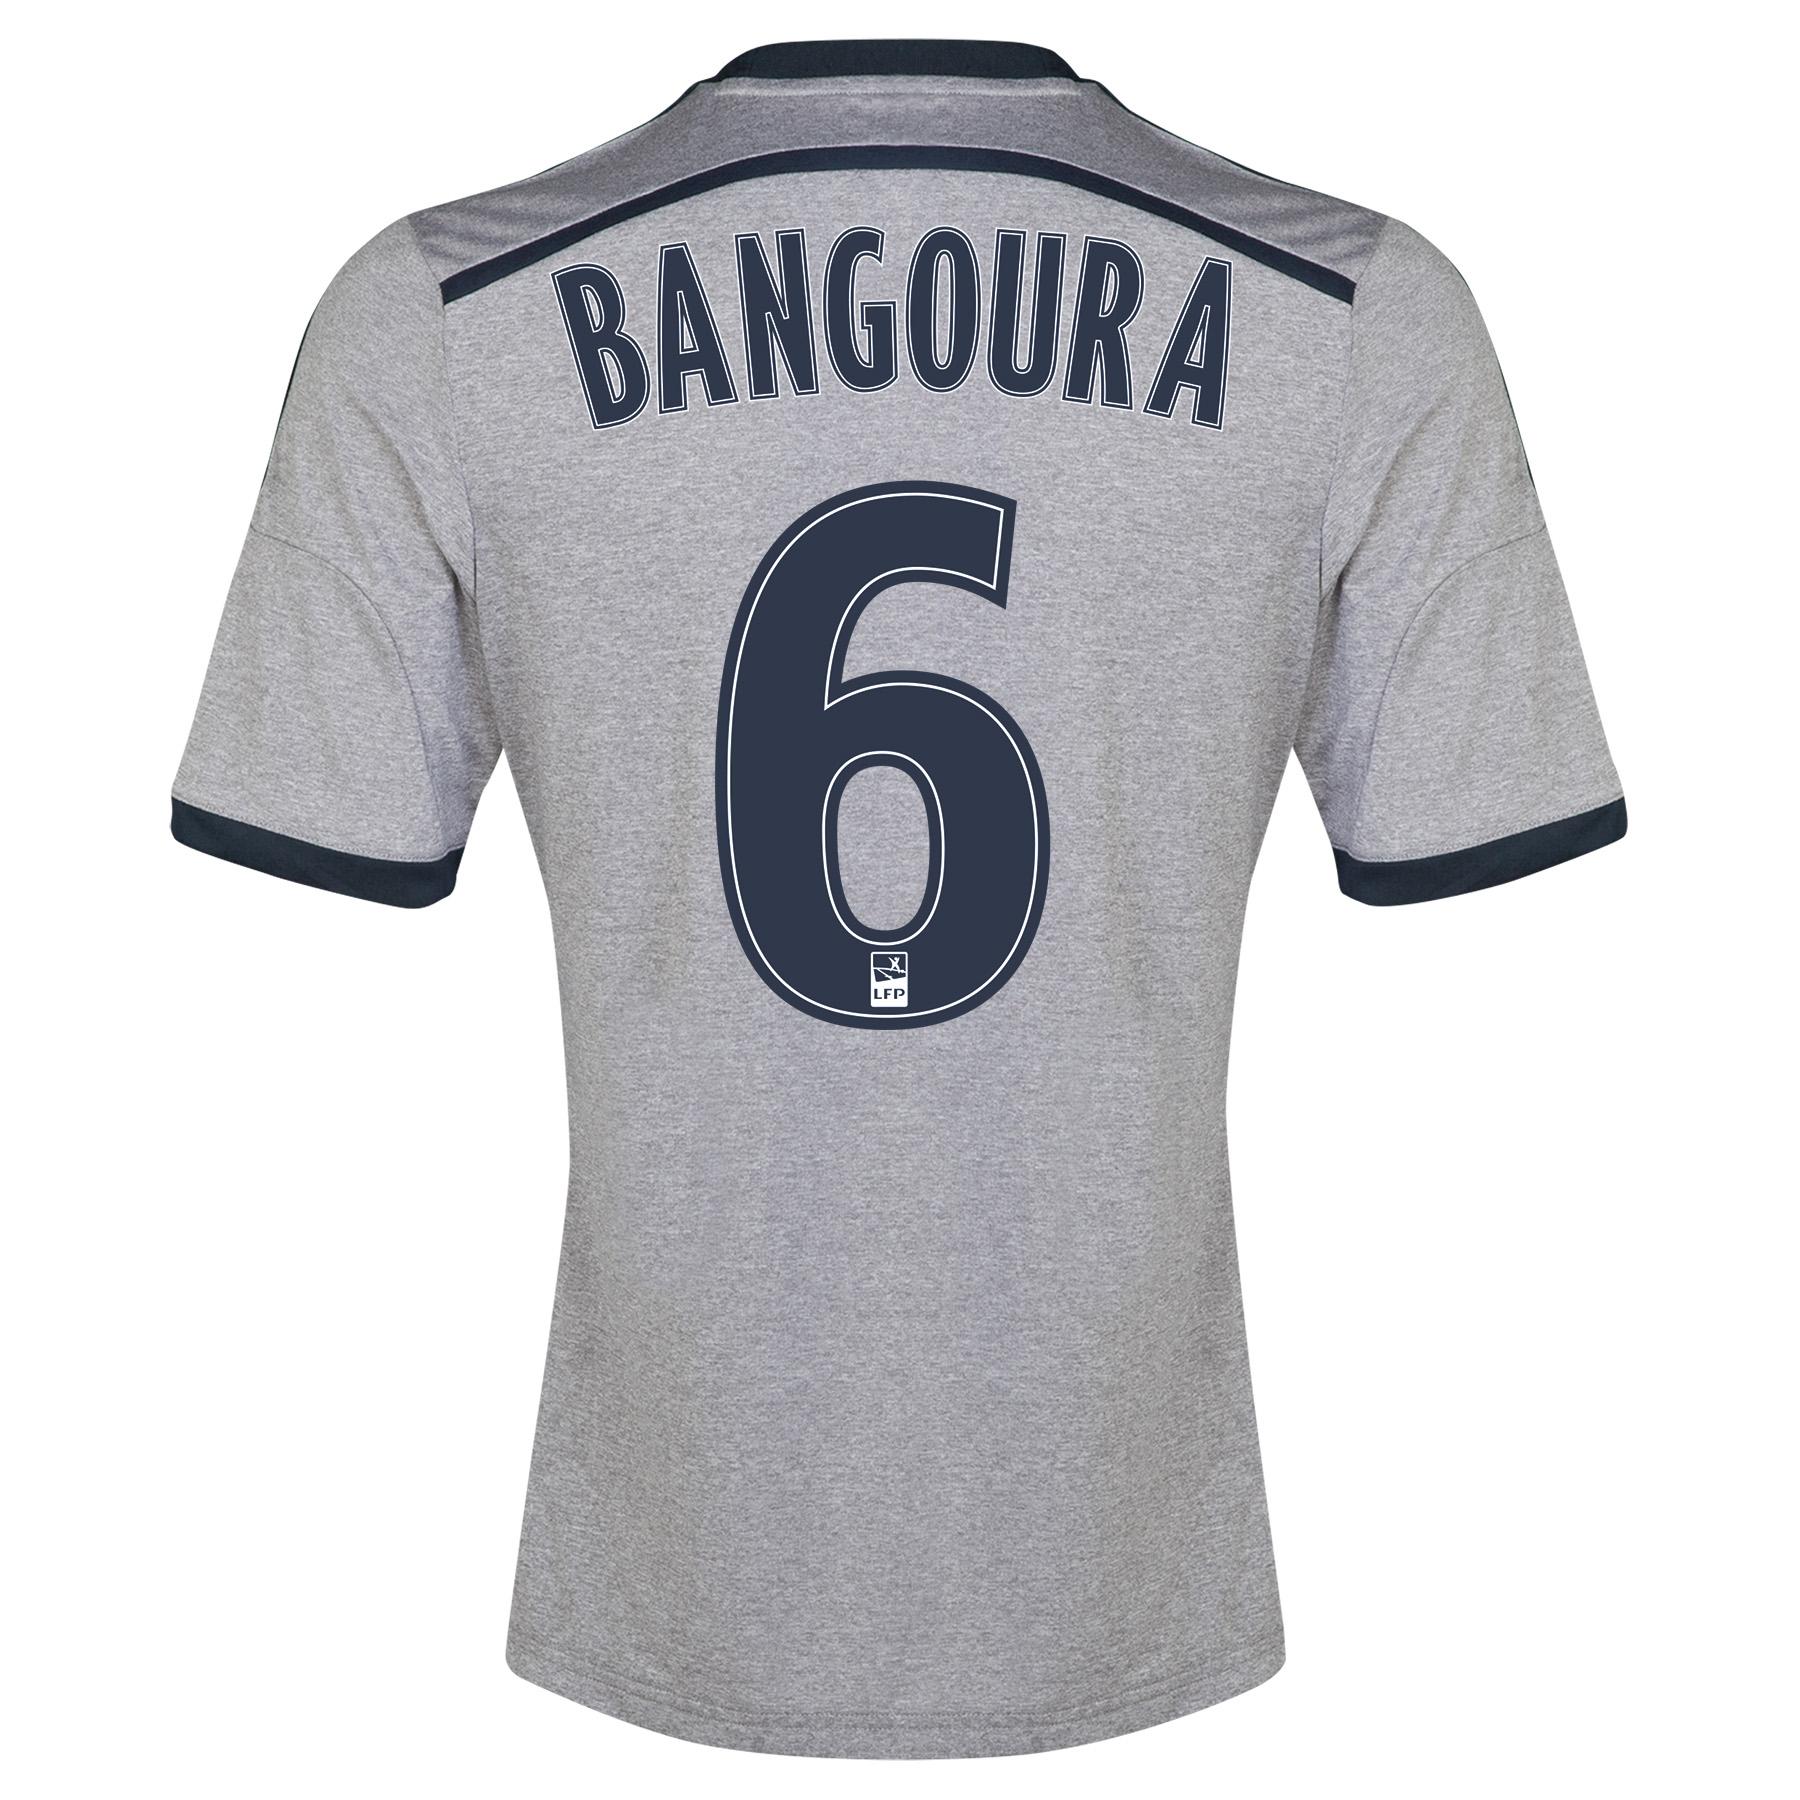 Olympique de Marseille Away Shirt Short Sleeve 2014/15 Silver with Bangoura 6 printing